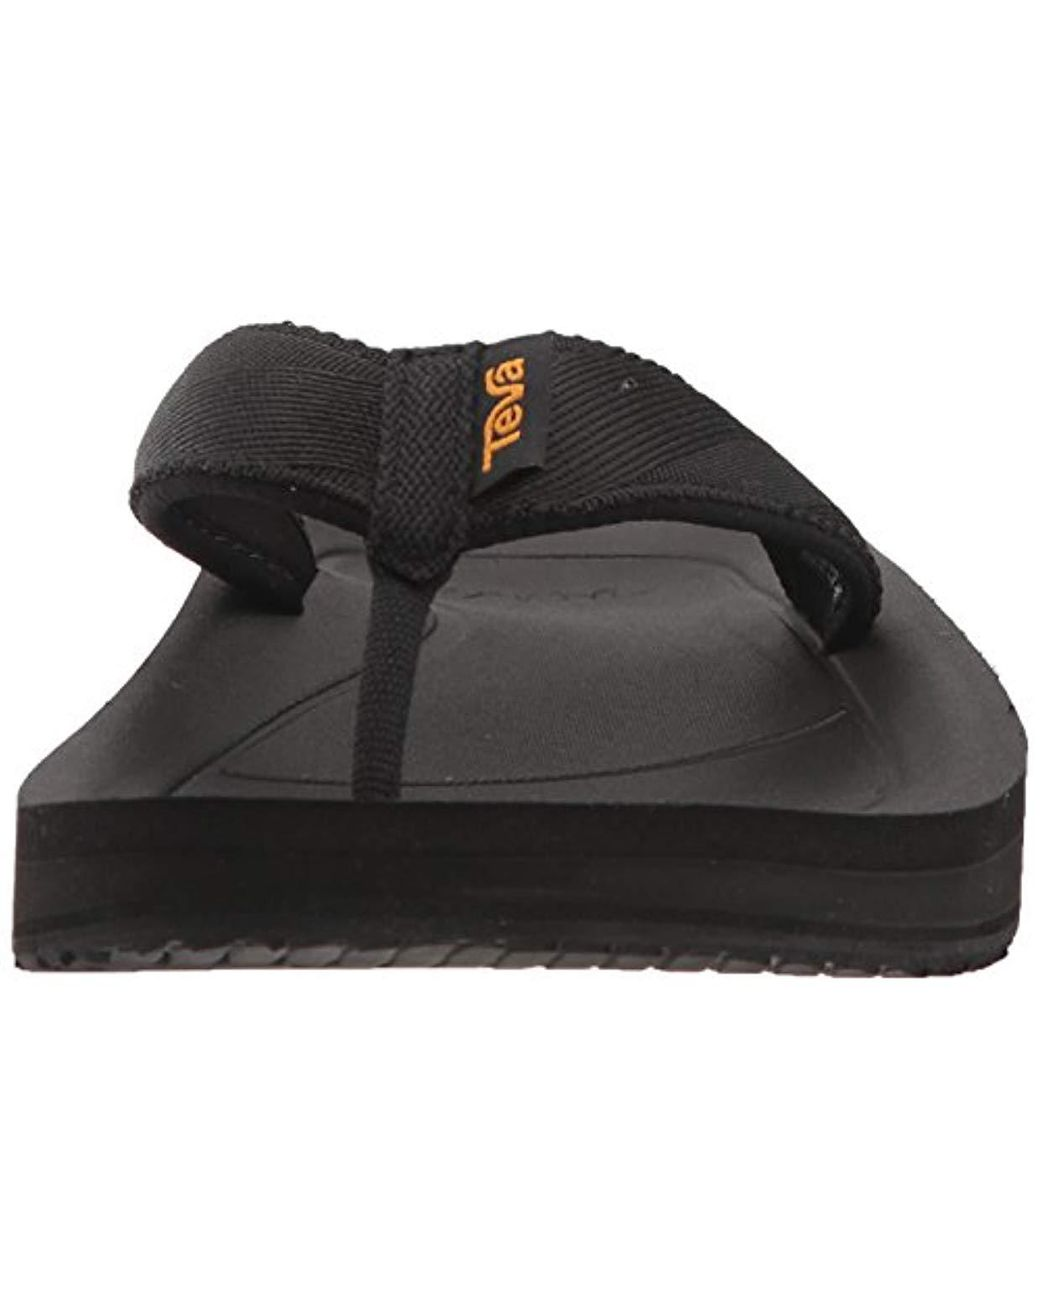 Men/'s Black TEVA Flip Premier Flip Flops